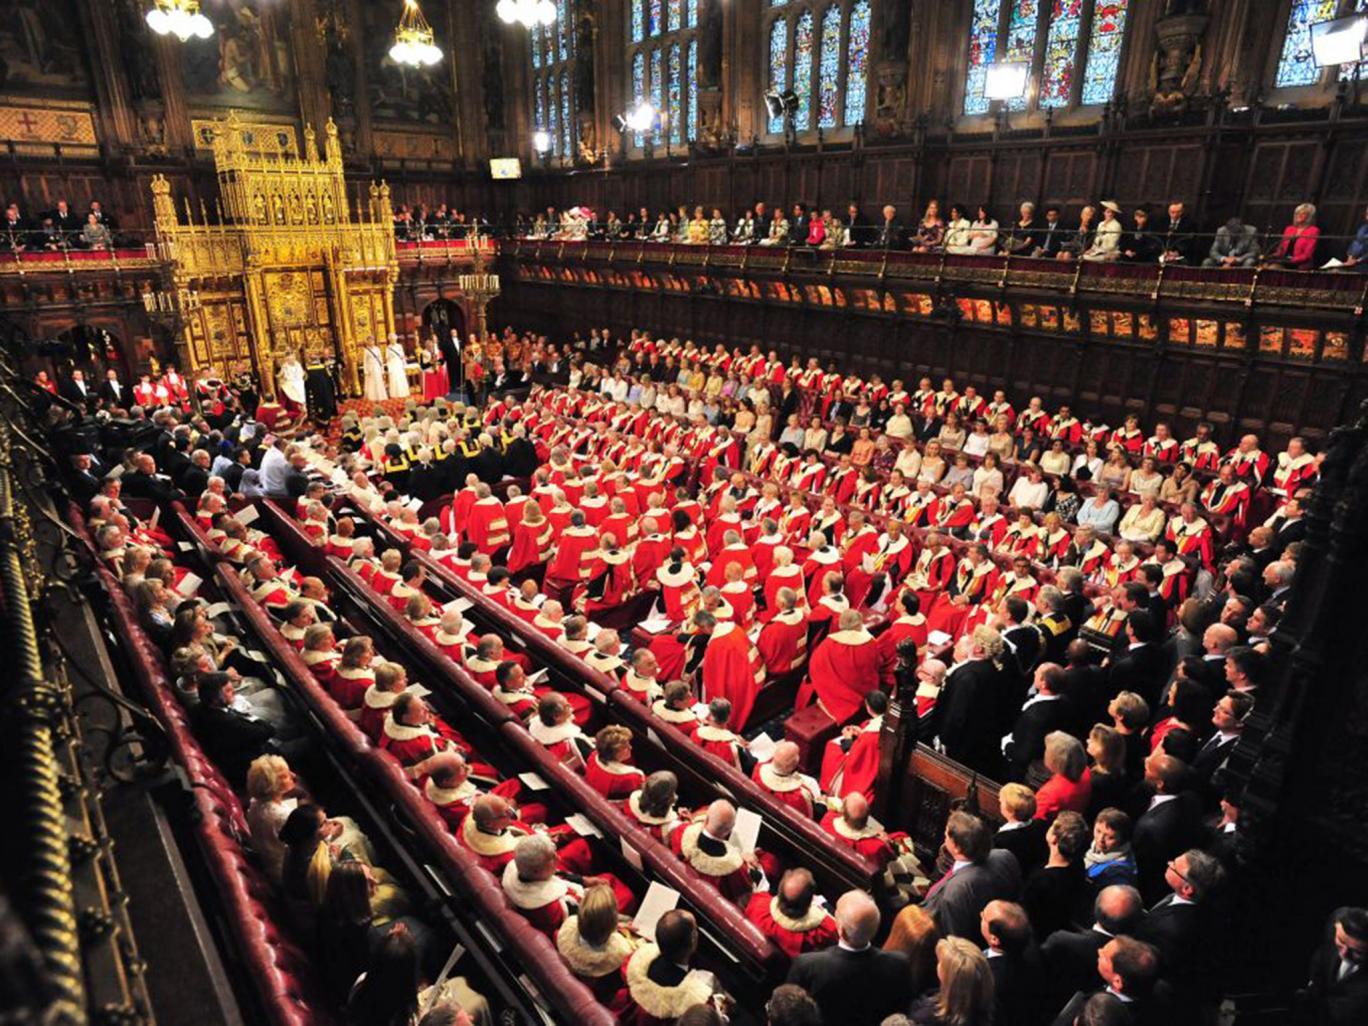 UK Peers Urge Pro-Iran, Pro-Palestinian Policies, UK Peers Urge Pro-Iran, Pro-Palestinian Policies